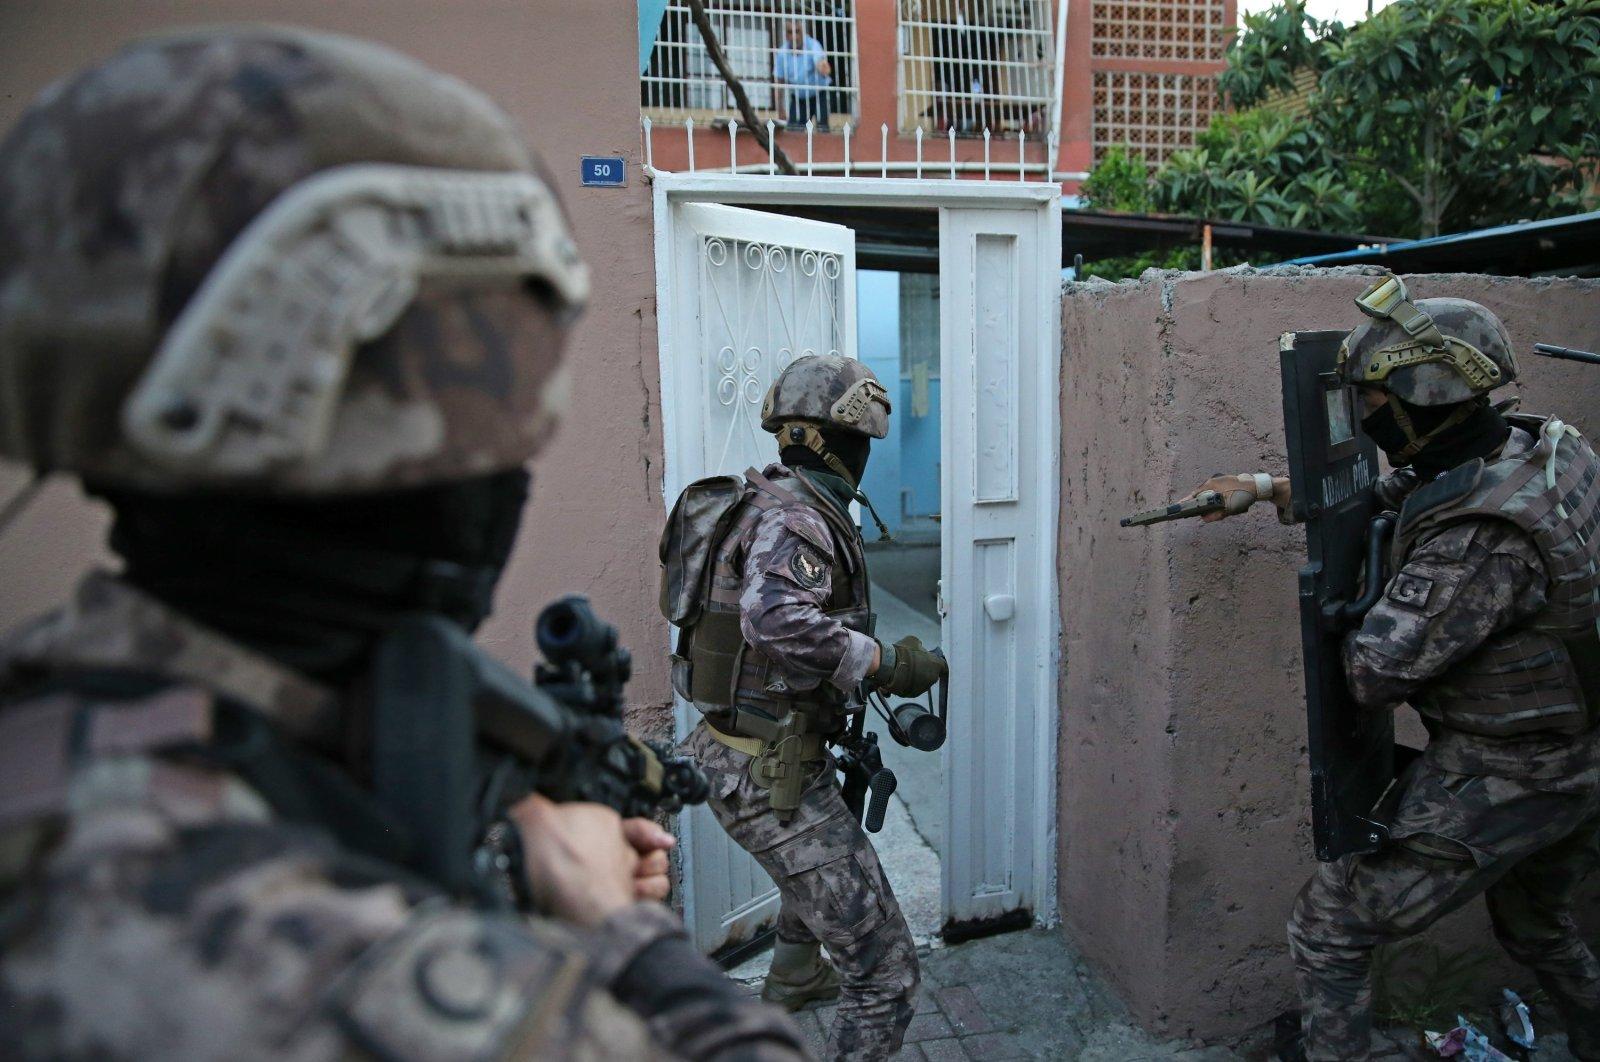 Counterterrorism police conduct an operation in Adana province, June 10, 2020. (AA File Photo)